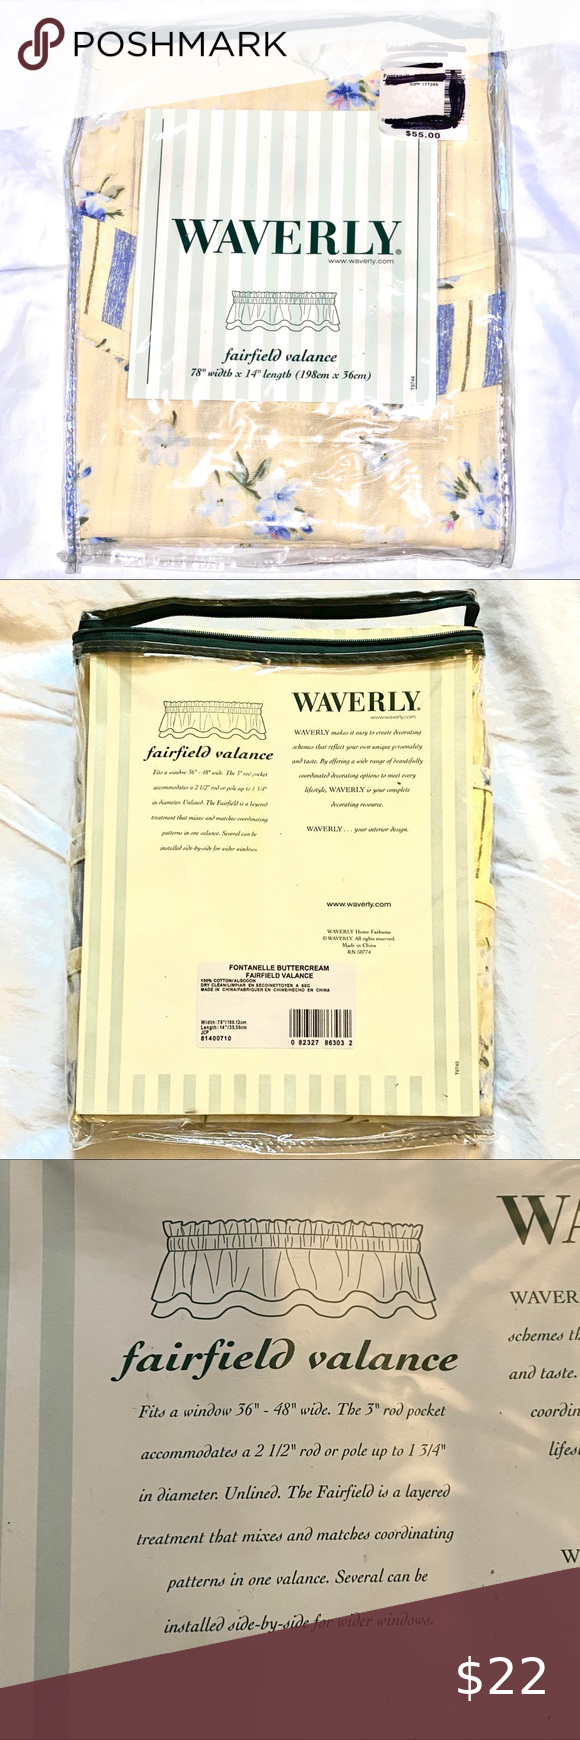 Waverly Fairfield Valance Fontanelle Buttercream Waverly Fairfield Valance